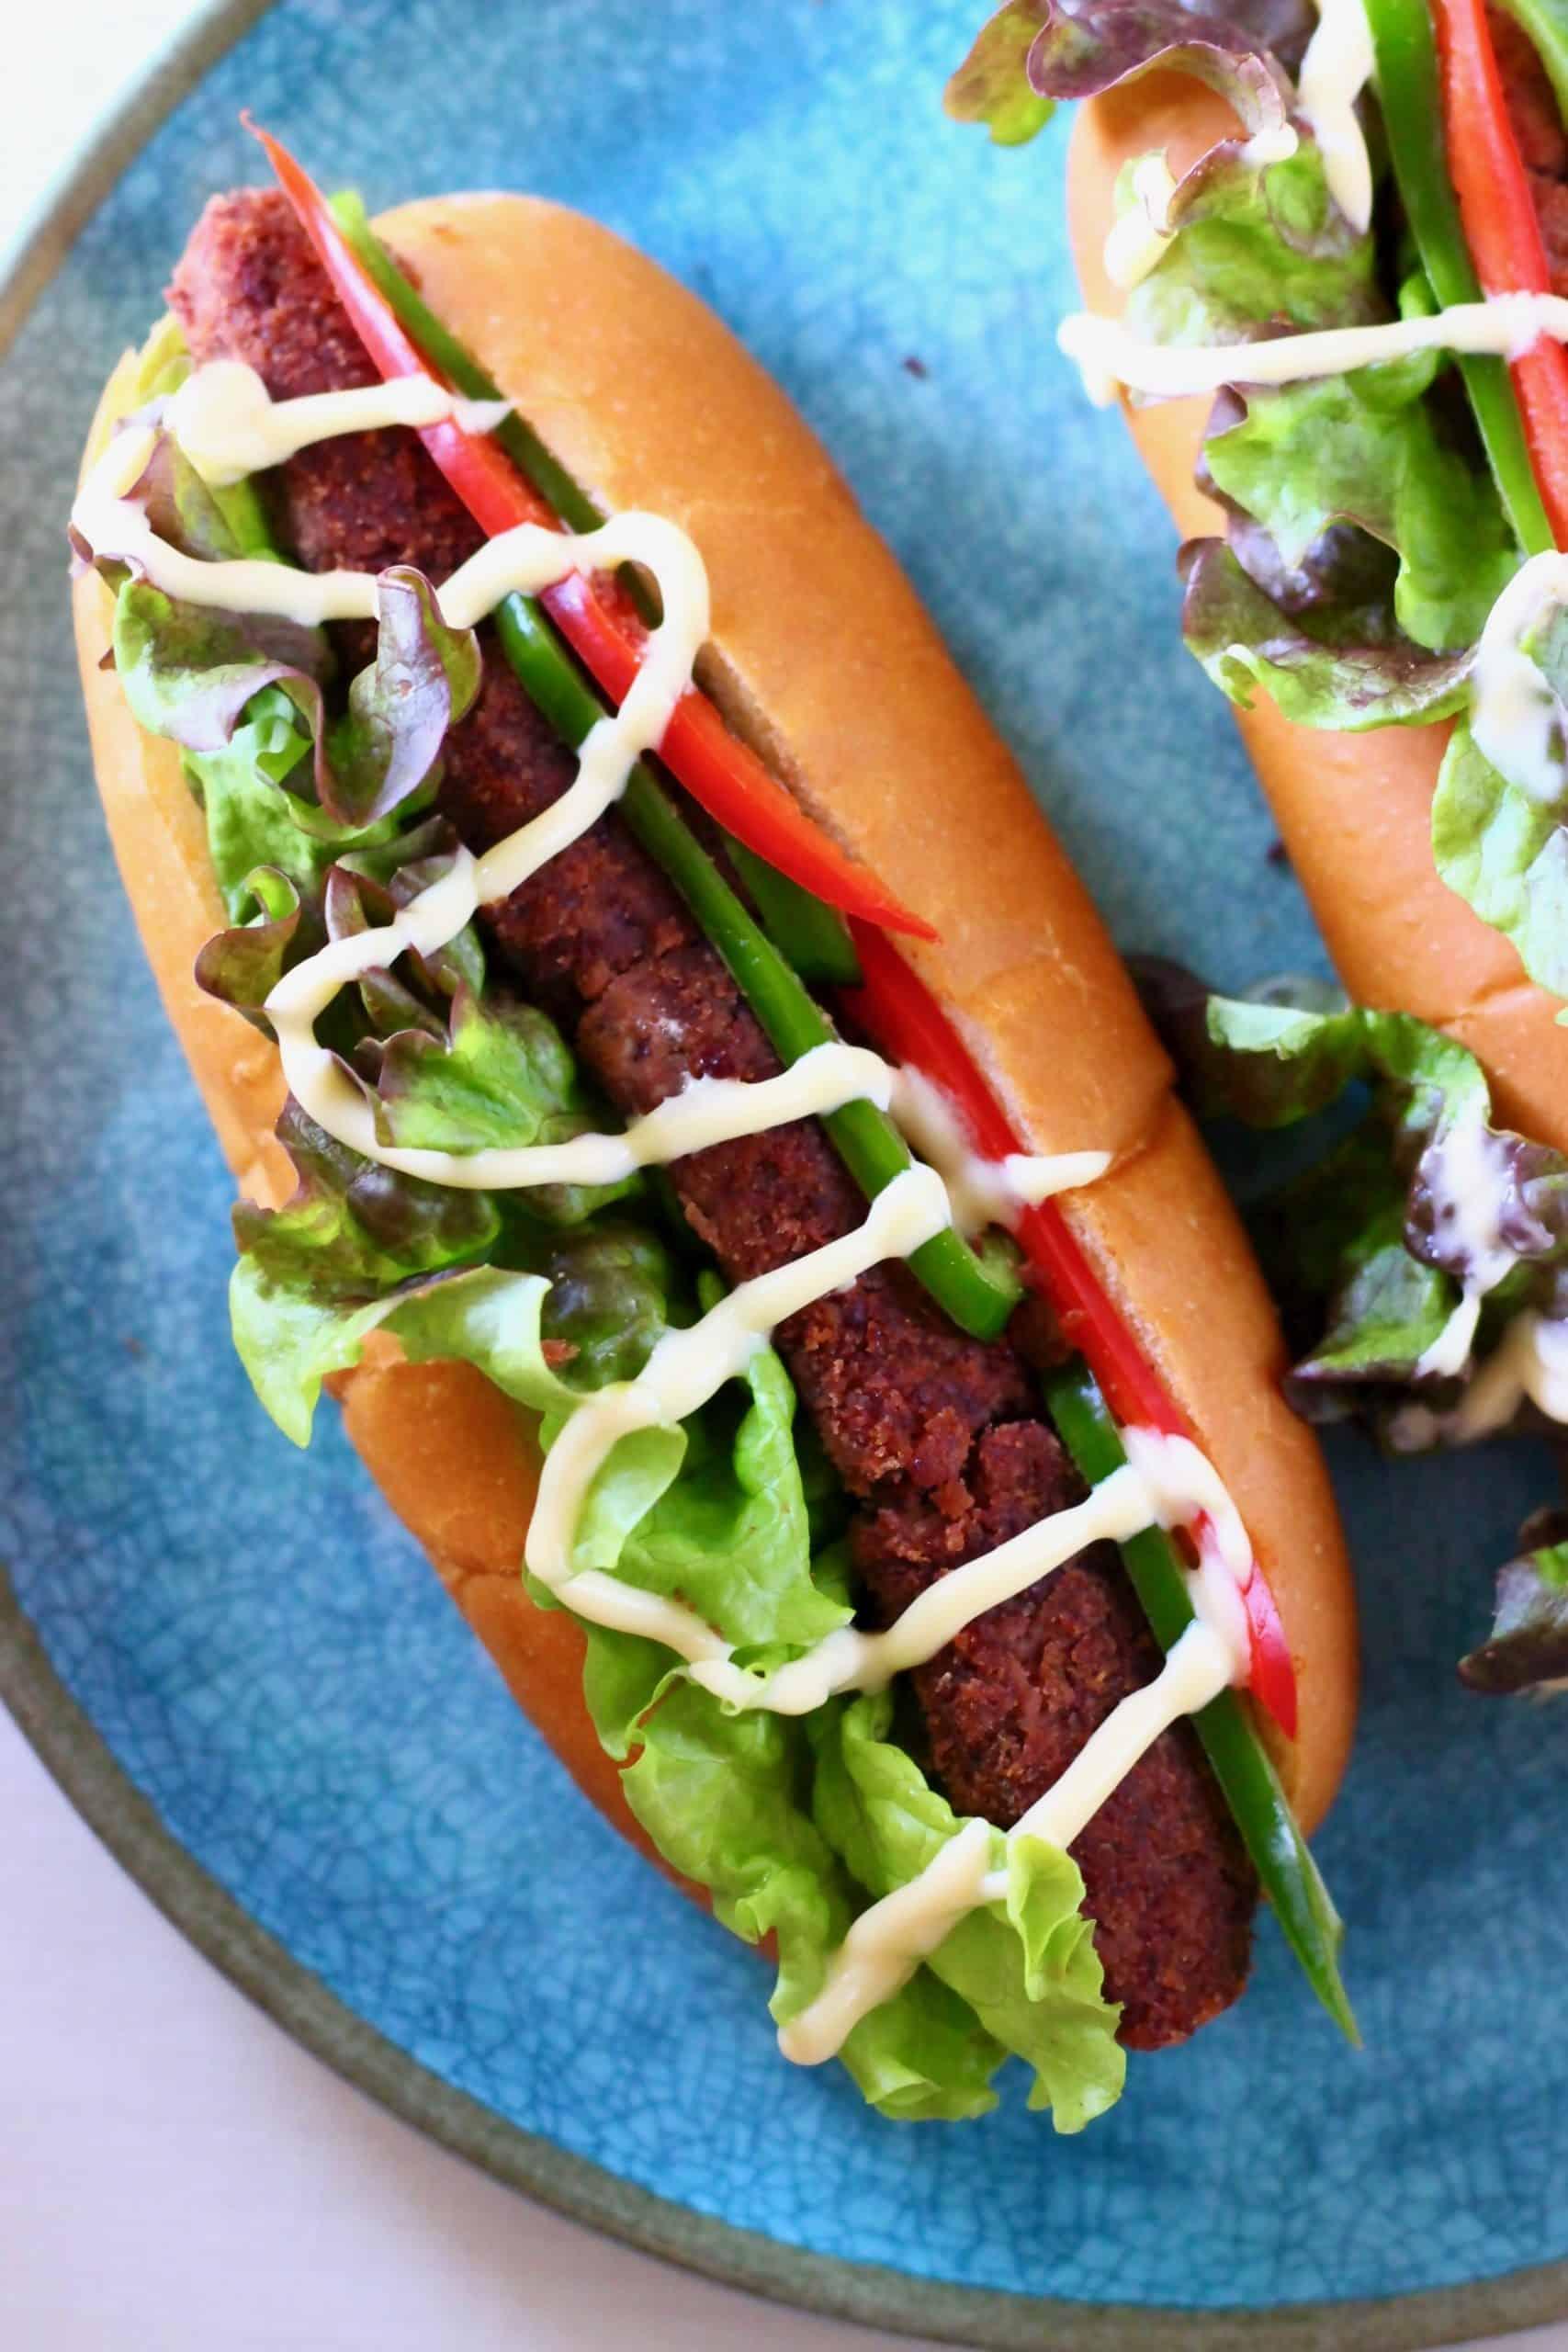 Vegan chorizo hot dogs in hot dog buns with salad and mayonnaise